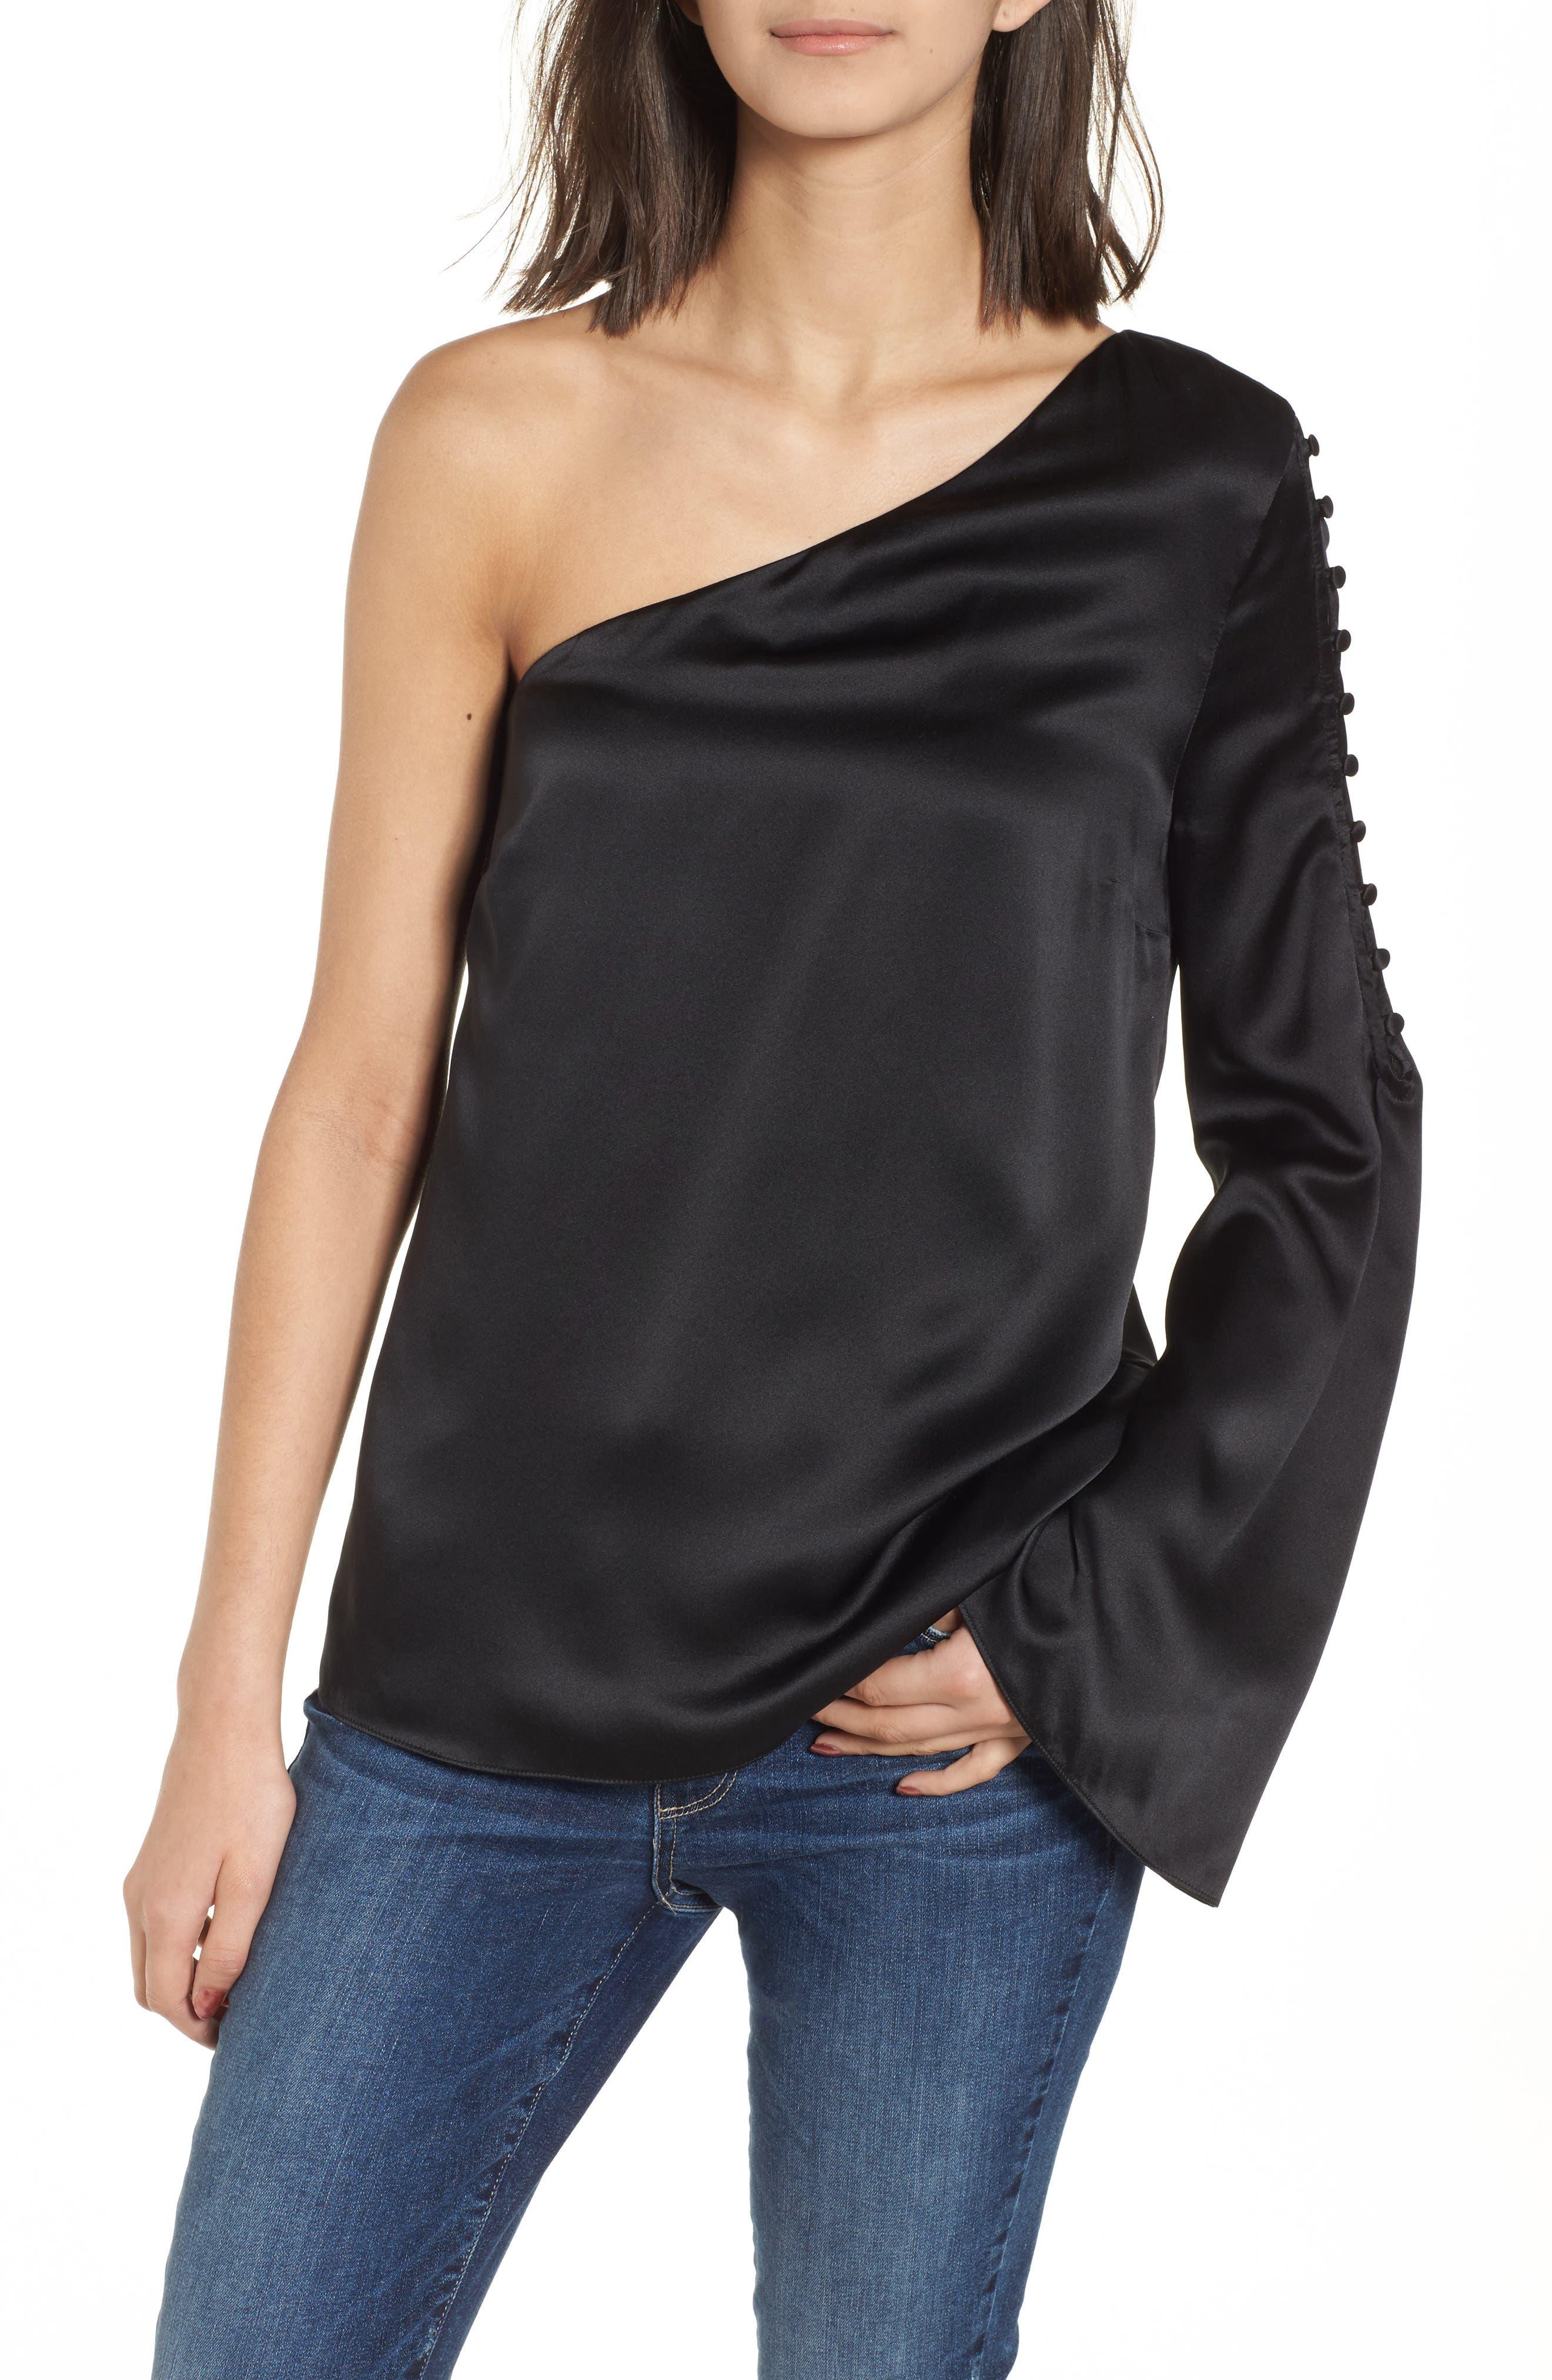 Ripley One-Shoulder Silk Blouse,                             Main thumbnail 1, color,                             Black